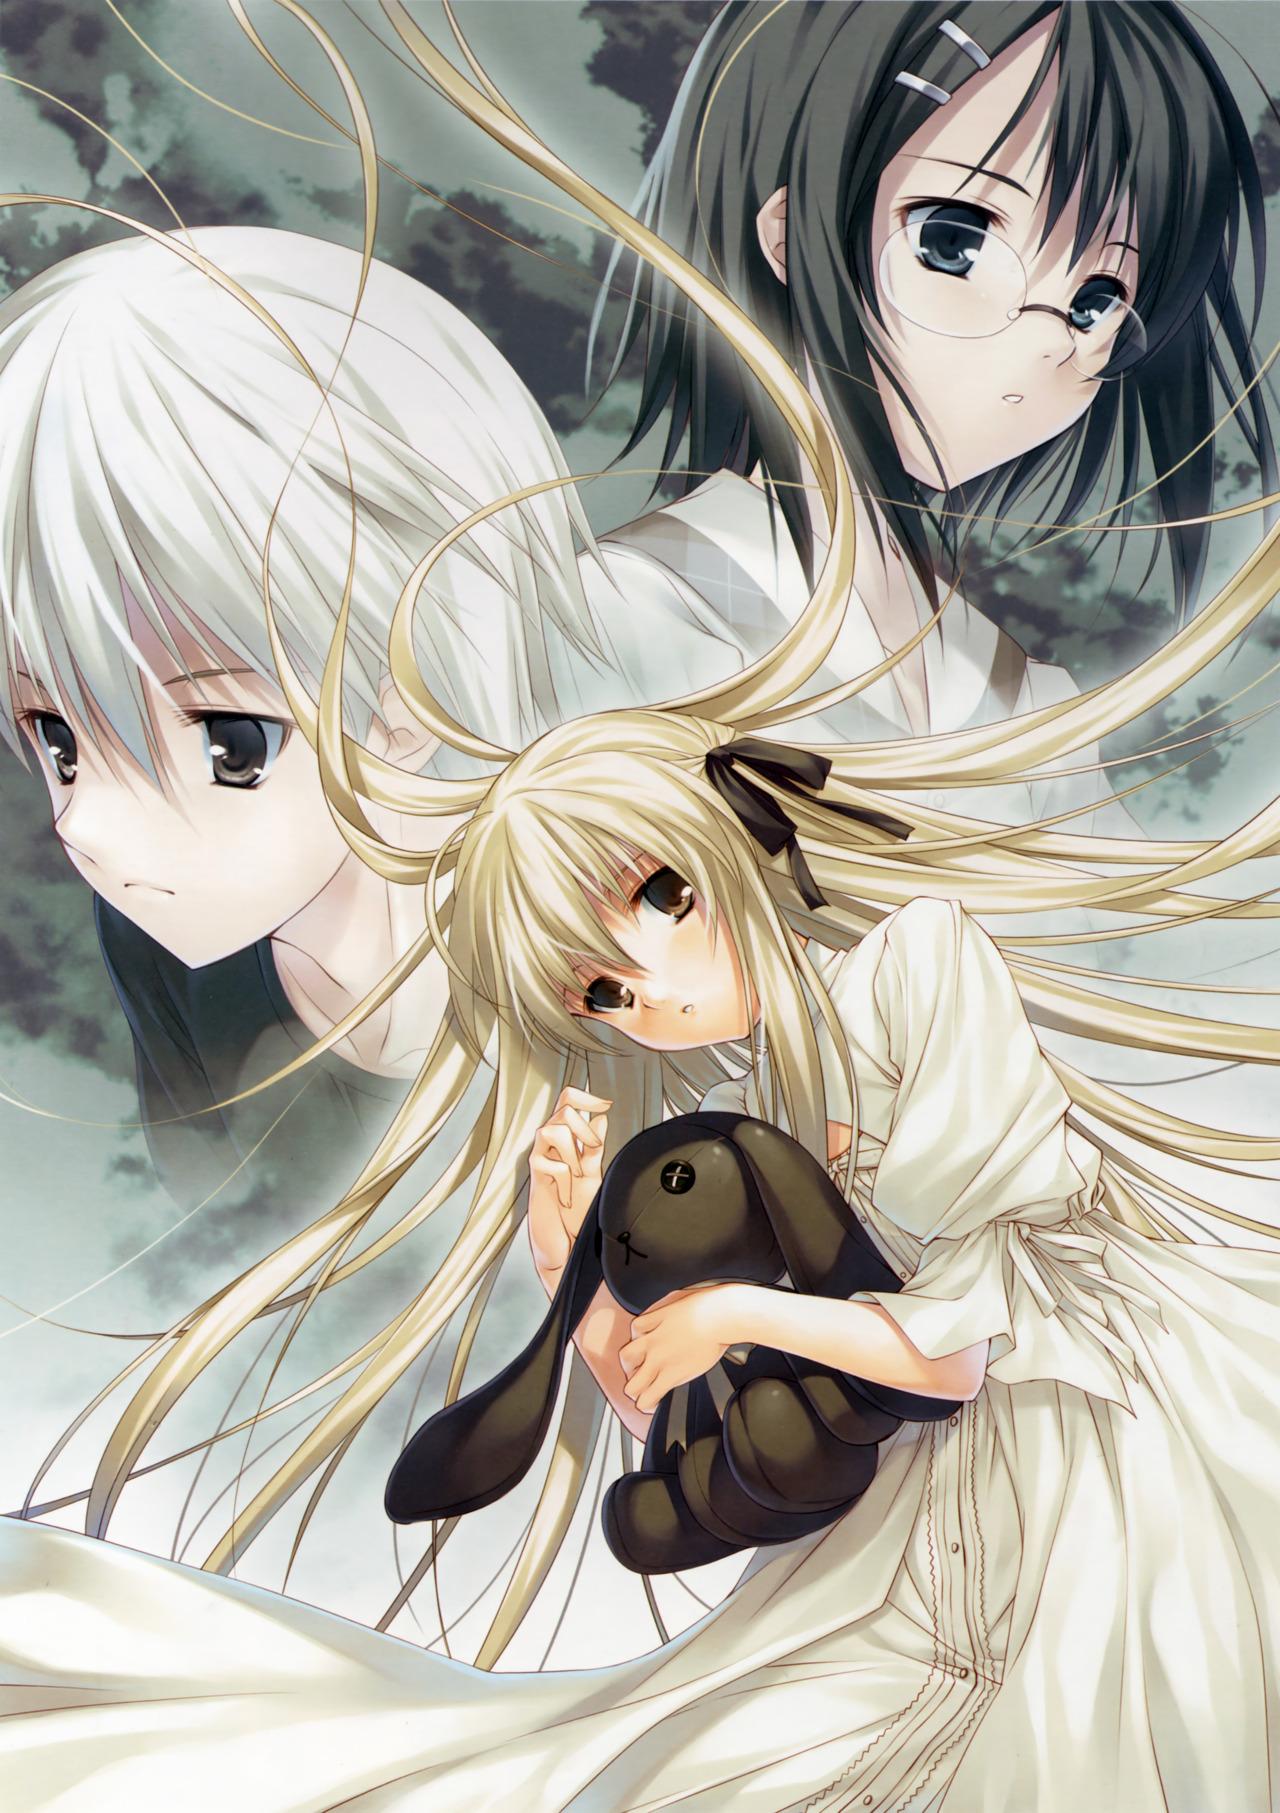 Связанные девочки аниме 7 фотография: www.ballett.ru/page/svyazannye-devochki-anime